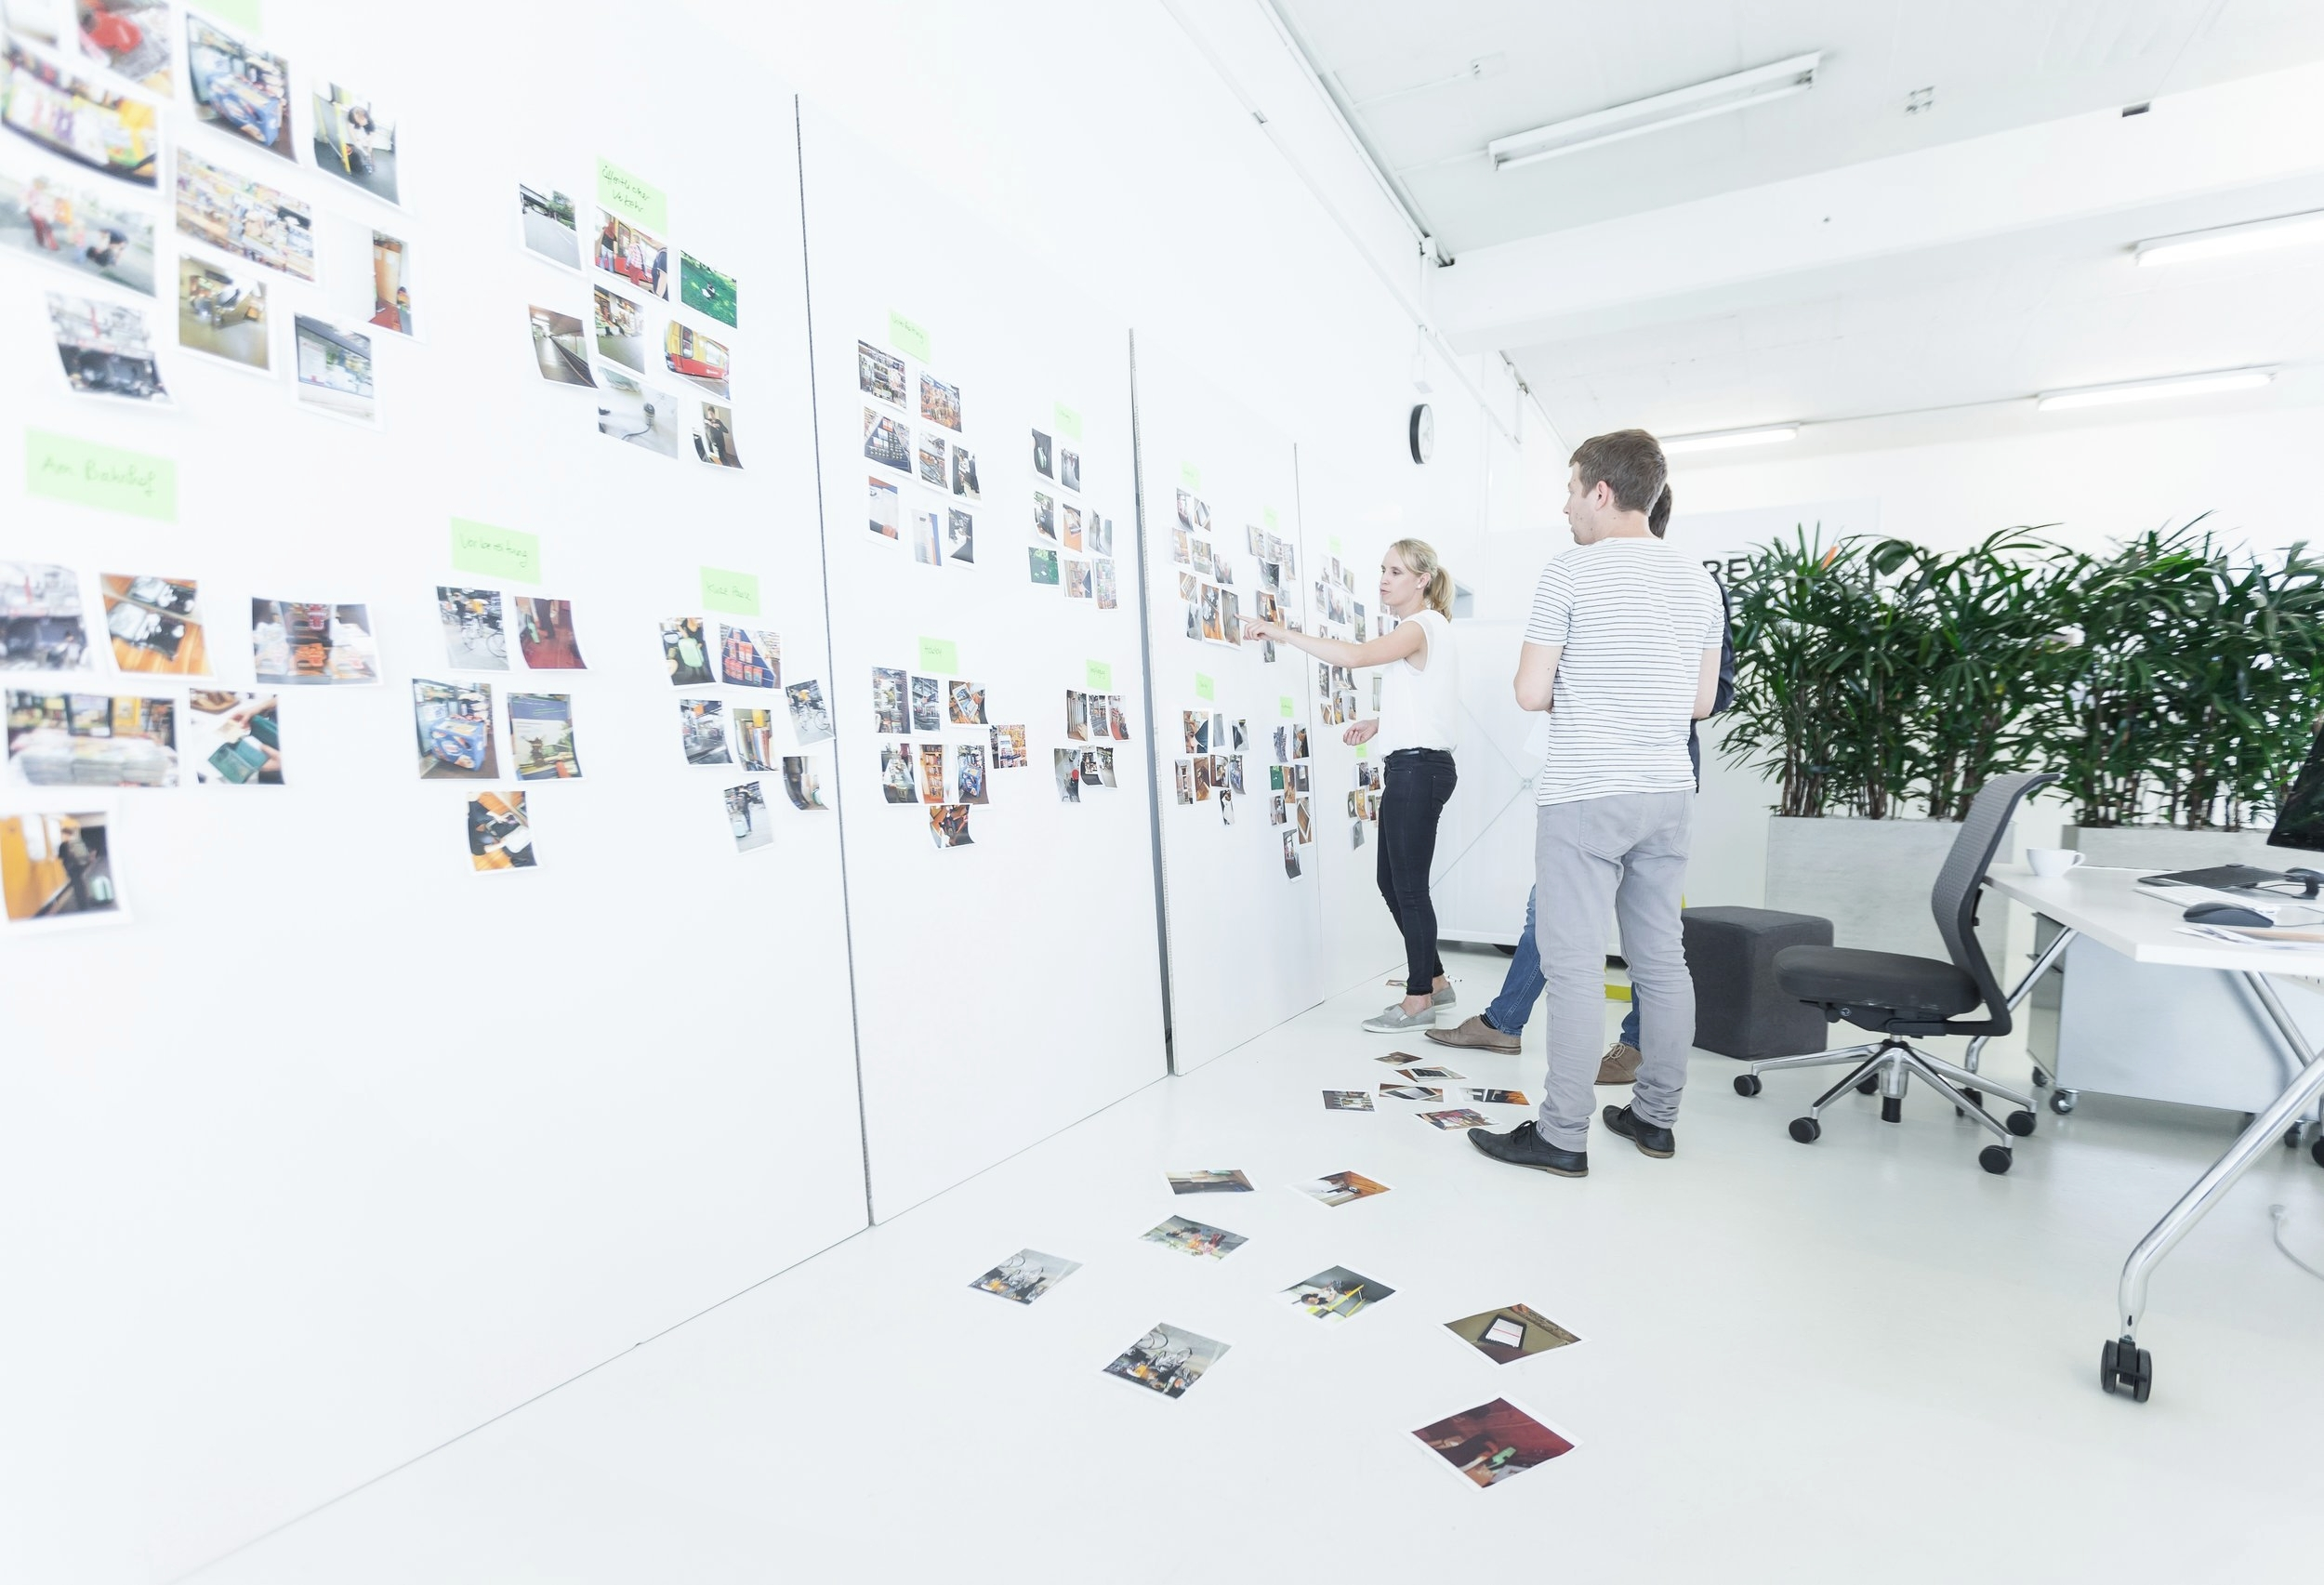 Design+Thinking+Whiteboard (1).jpeg